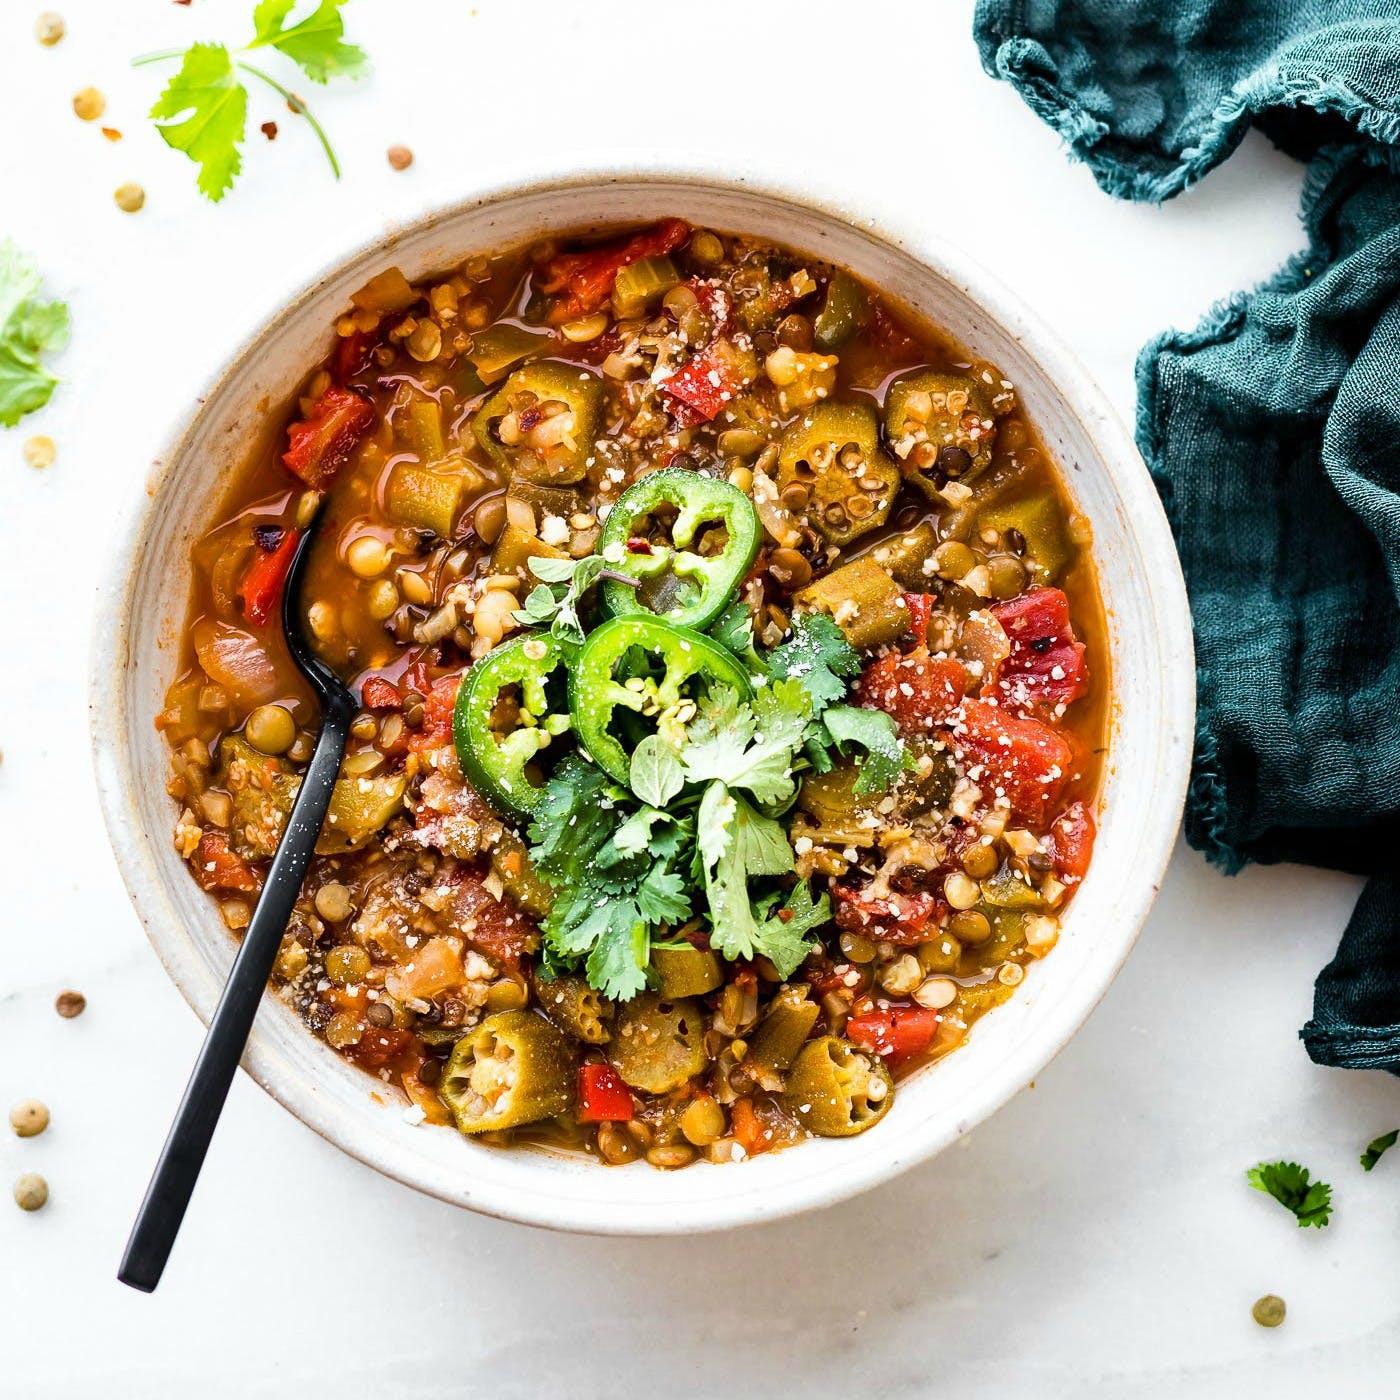 Easy Instant Pot Recipes Vegetarian  Easy Weeknight Vegan Instant Pot Recipes